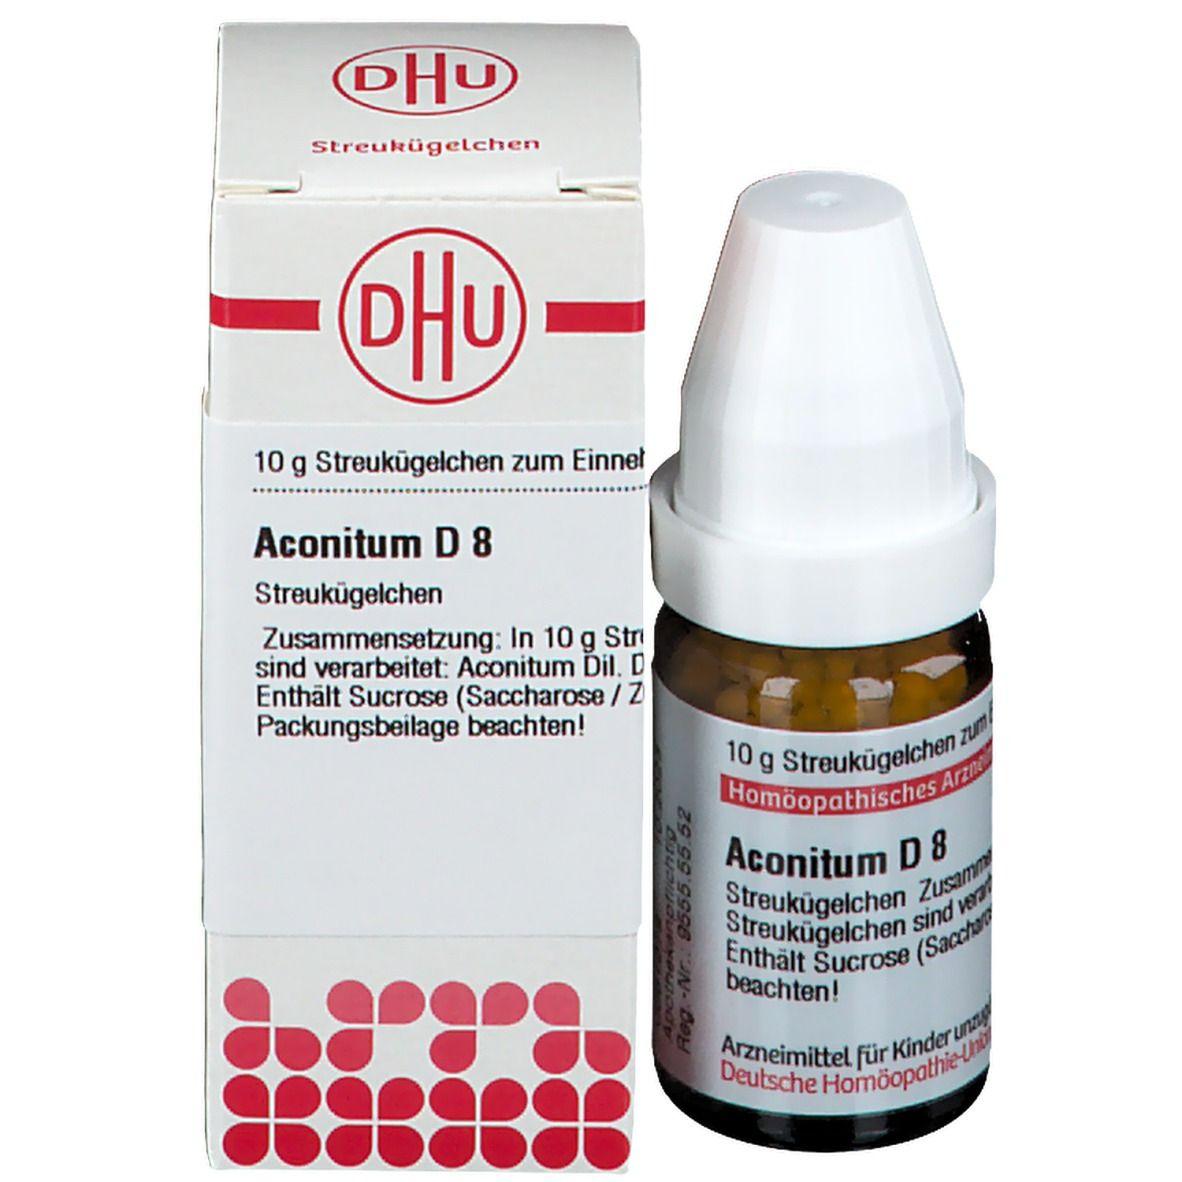 DHU Aconitum D8